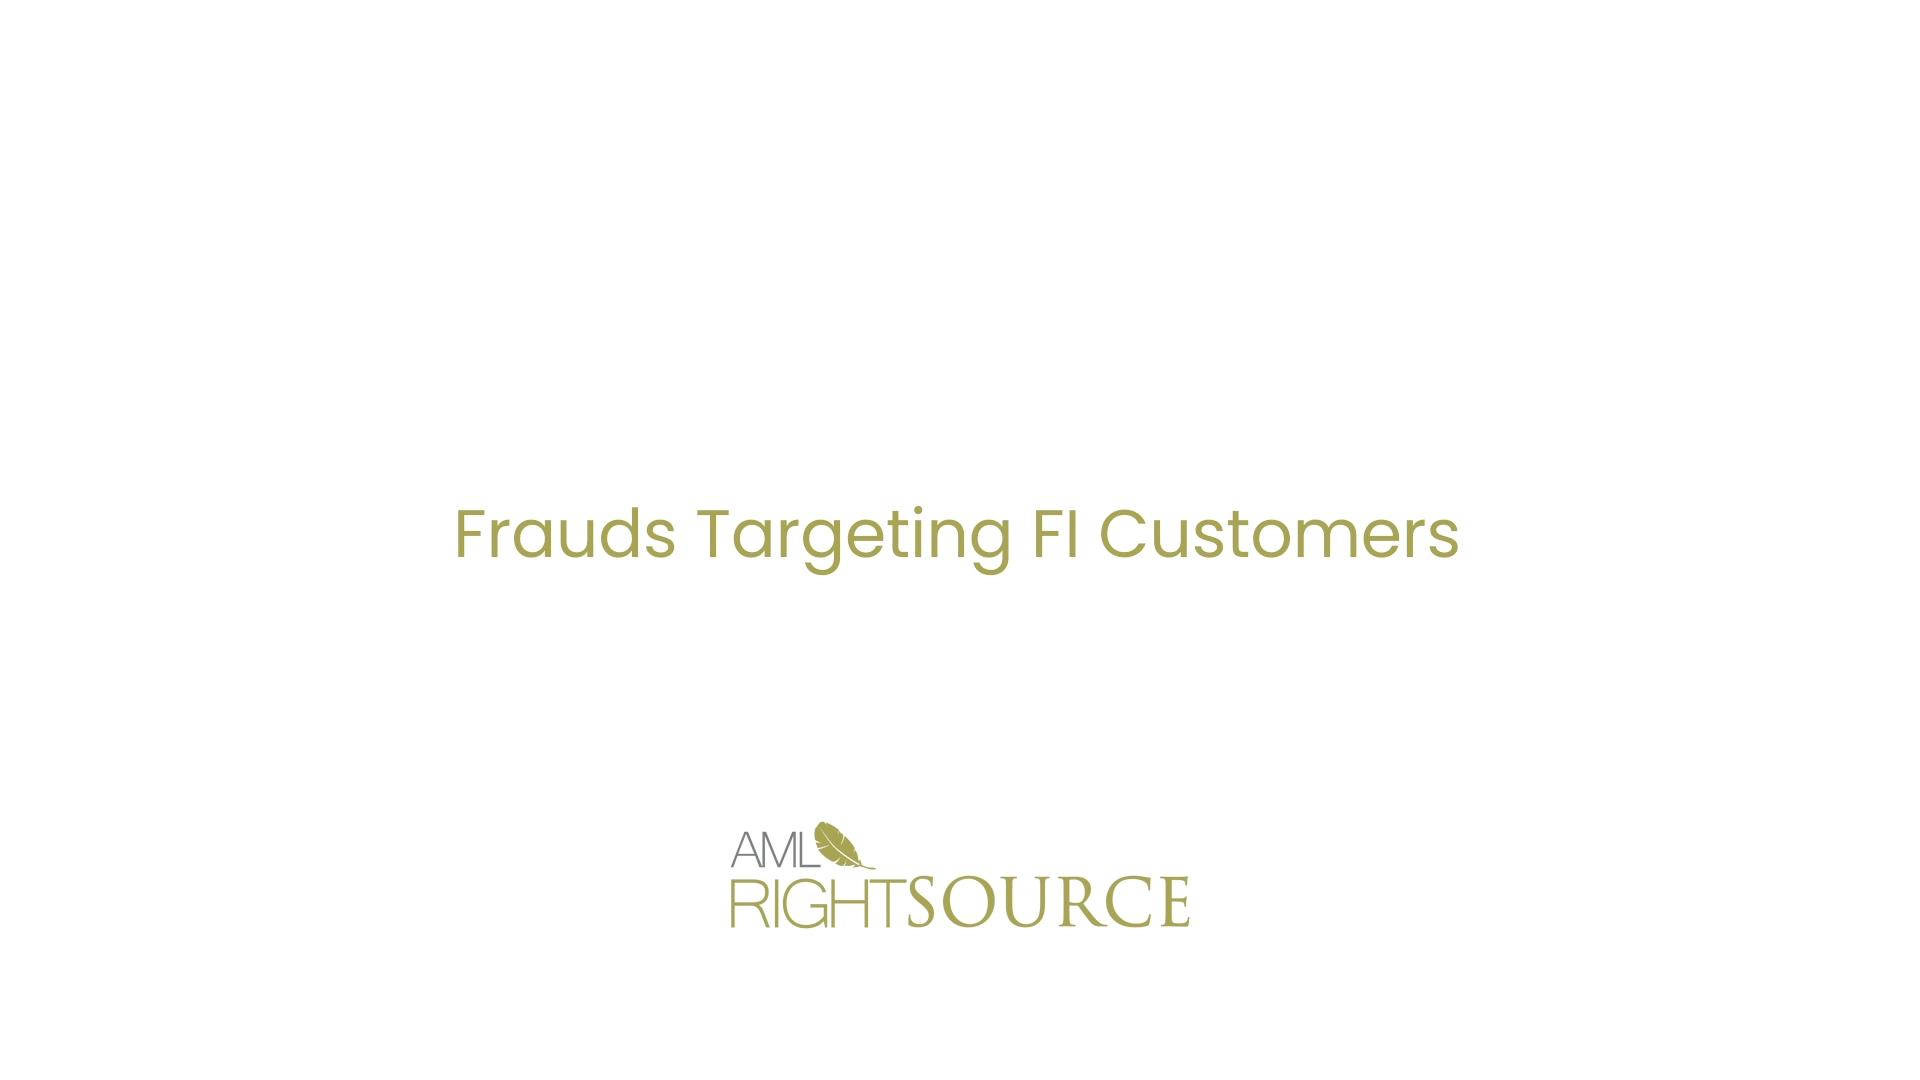 Frauds Targeting FI Customers